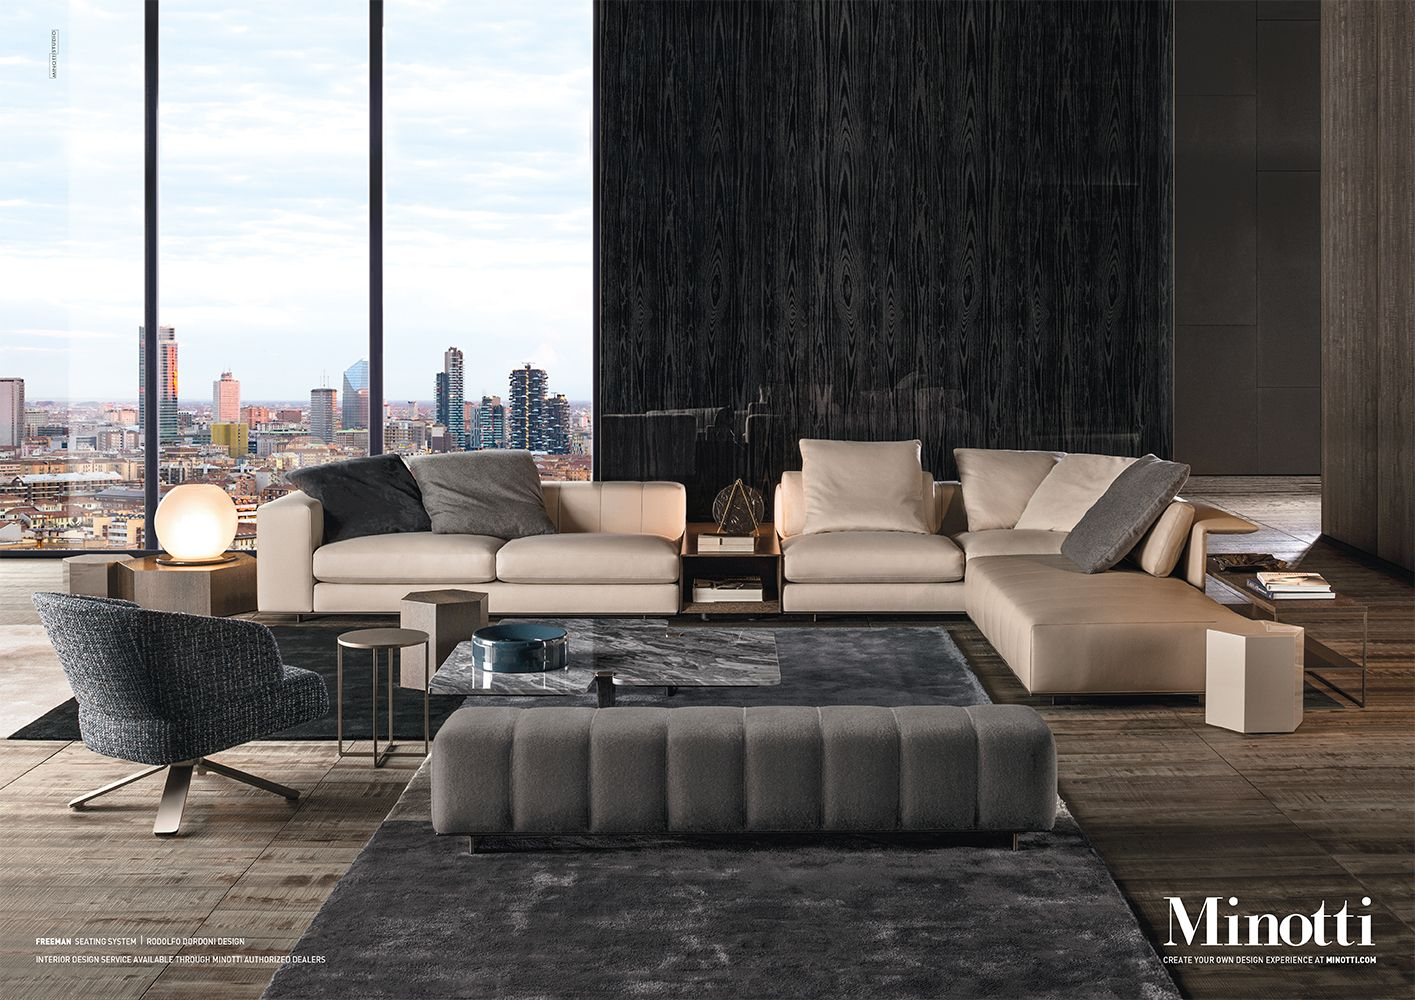 Delicieux Freeman Seating System, Rodolfo Dordoni Design #adv #freeman #sofau2026  Furniture Styles